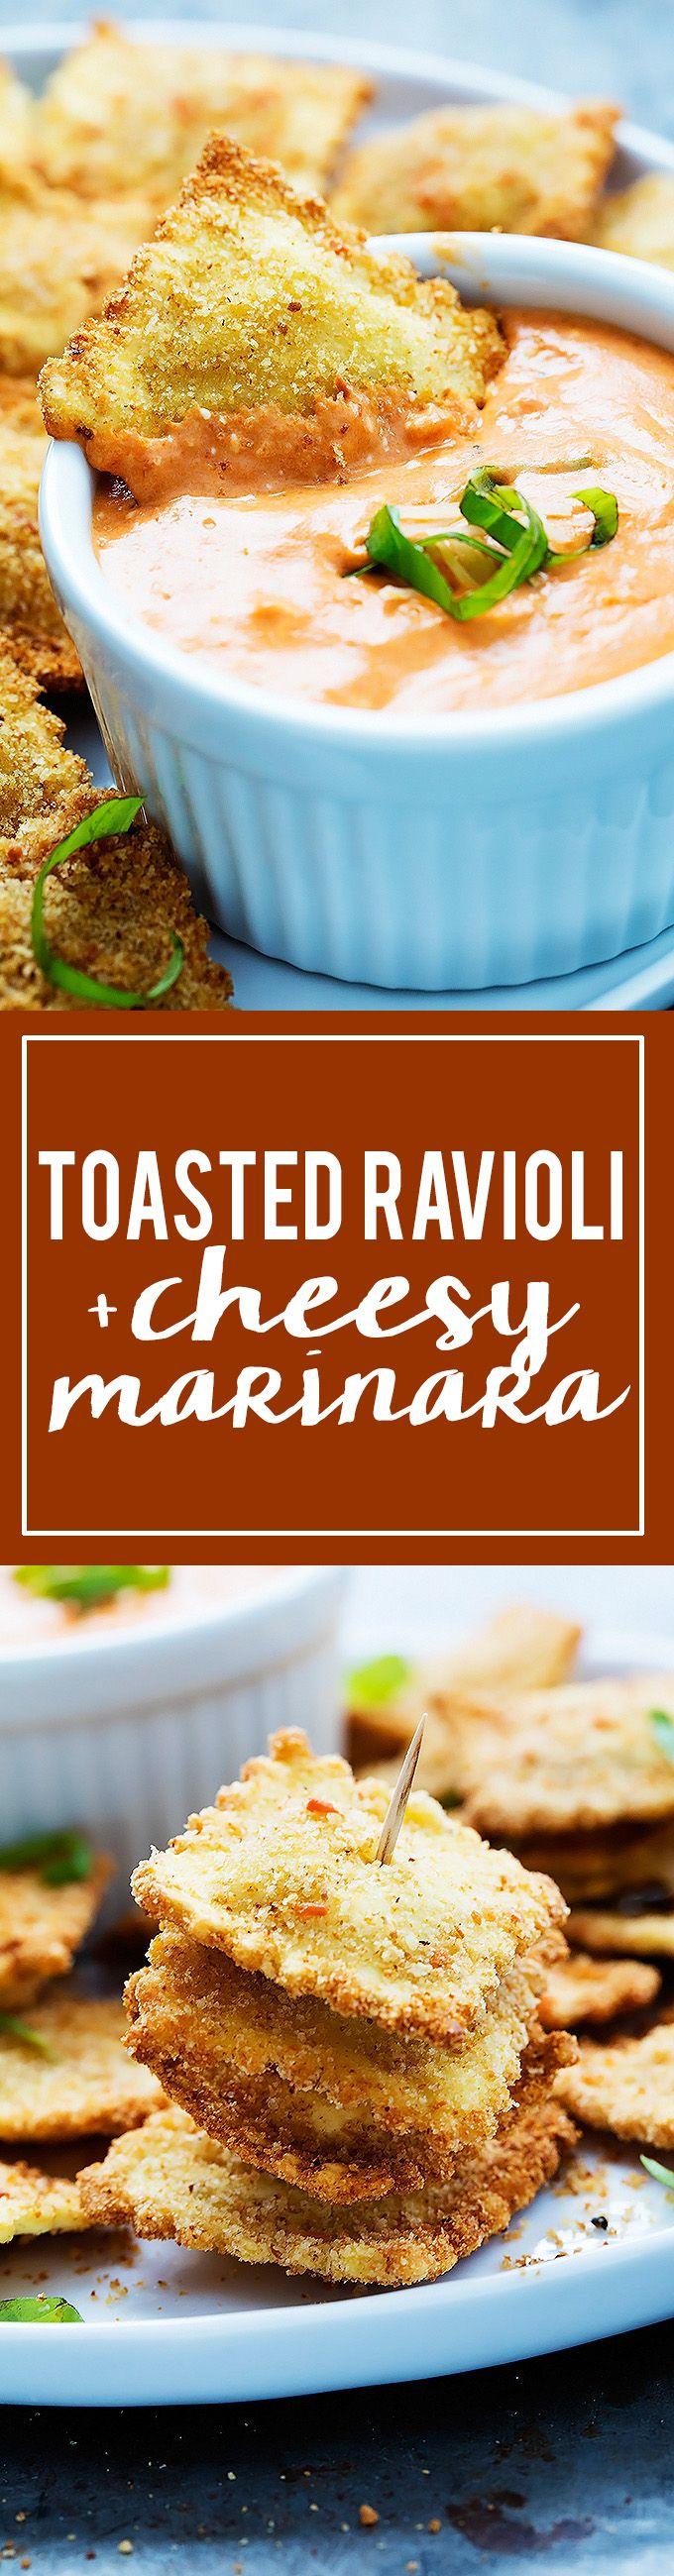 Easy Toasted Ravioli with Cheesy Marinara dipping sauce | Creme de la Crumb